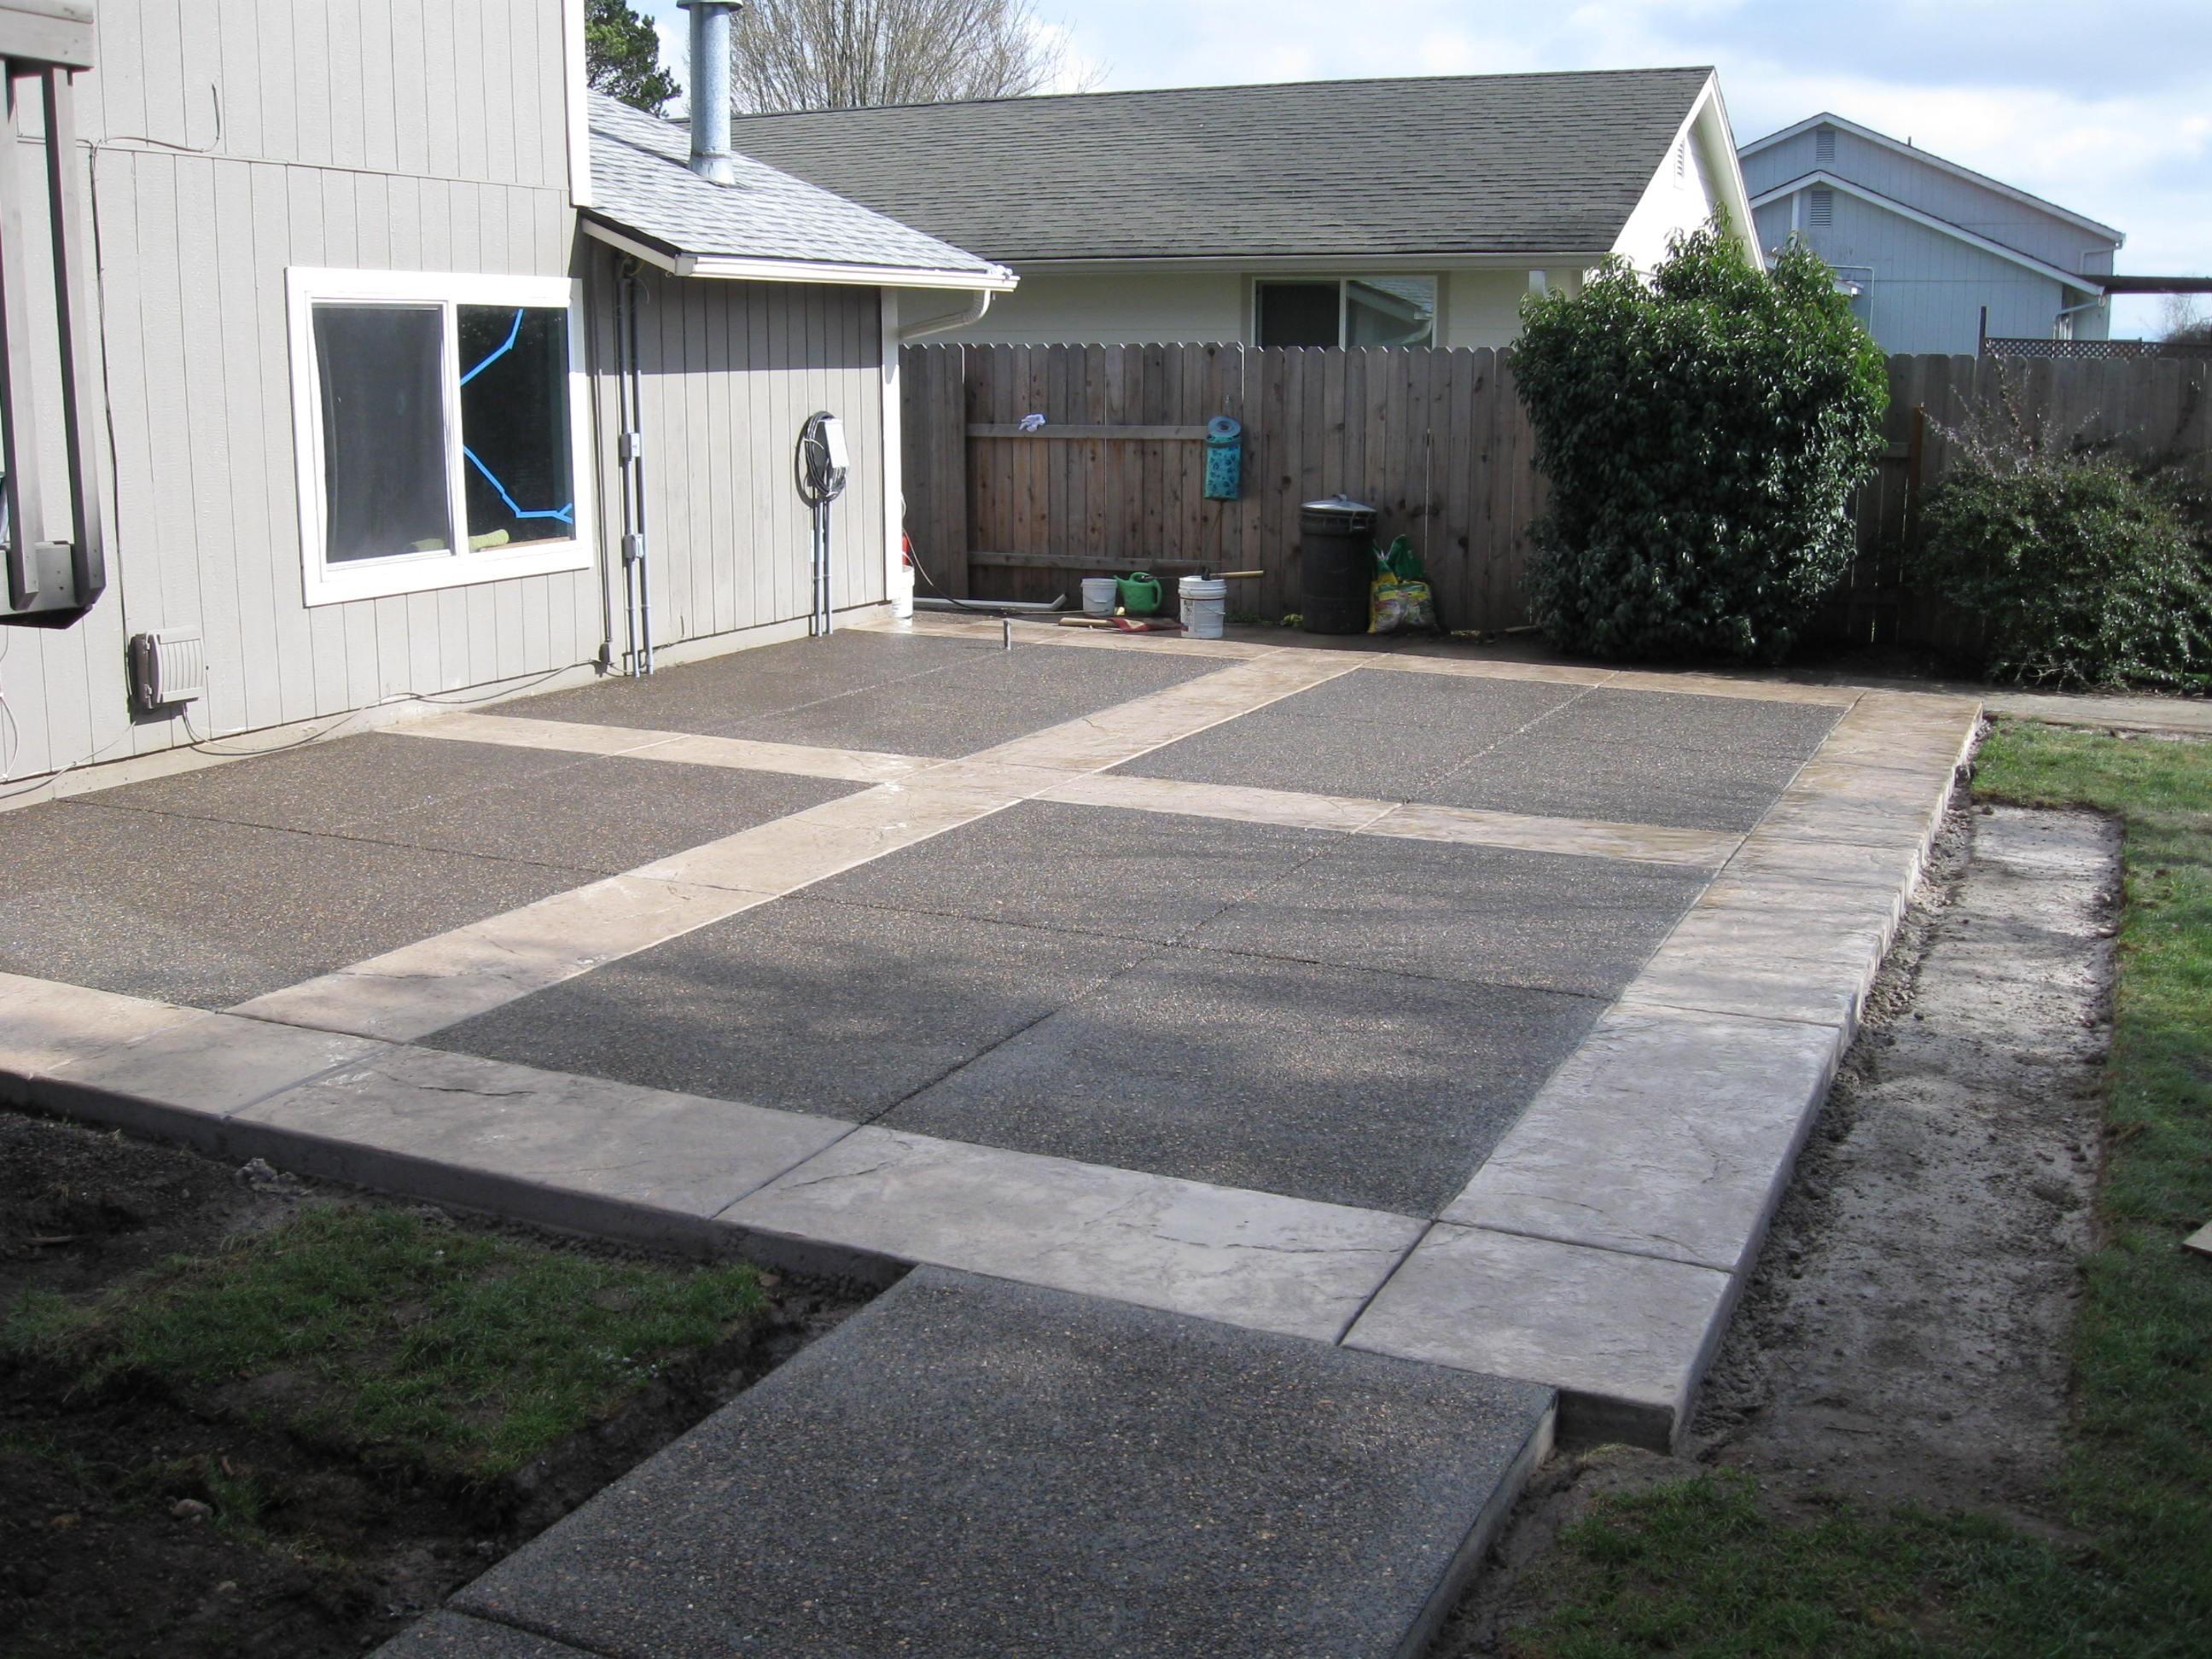 30 Nice Ideas How To Makeover Concrete Patio For Small Backyards Simphome